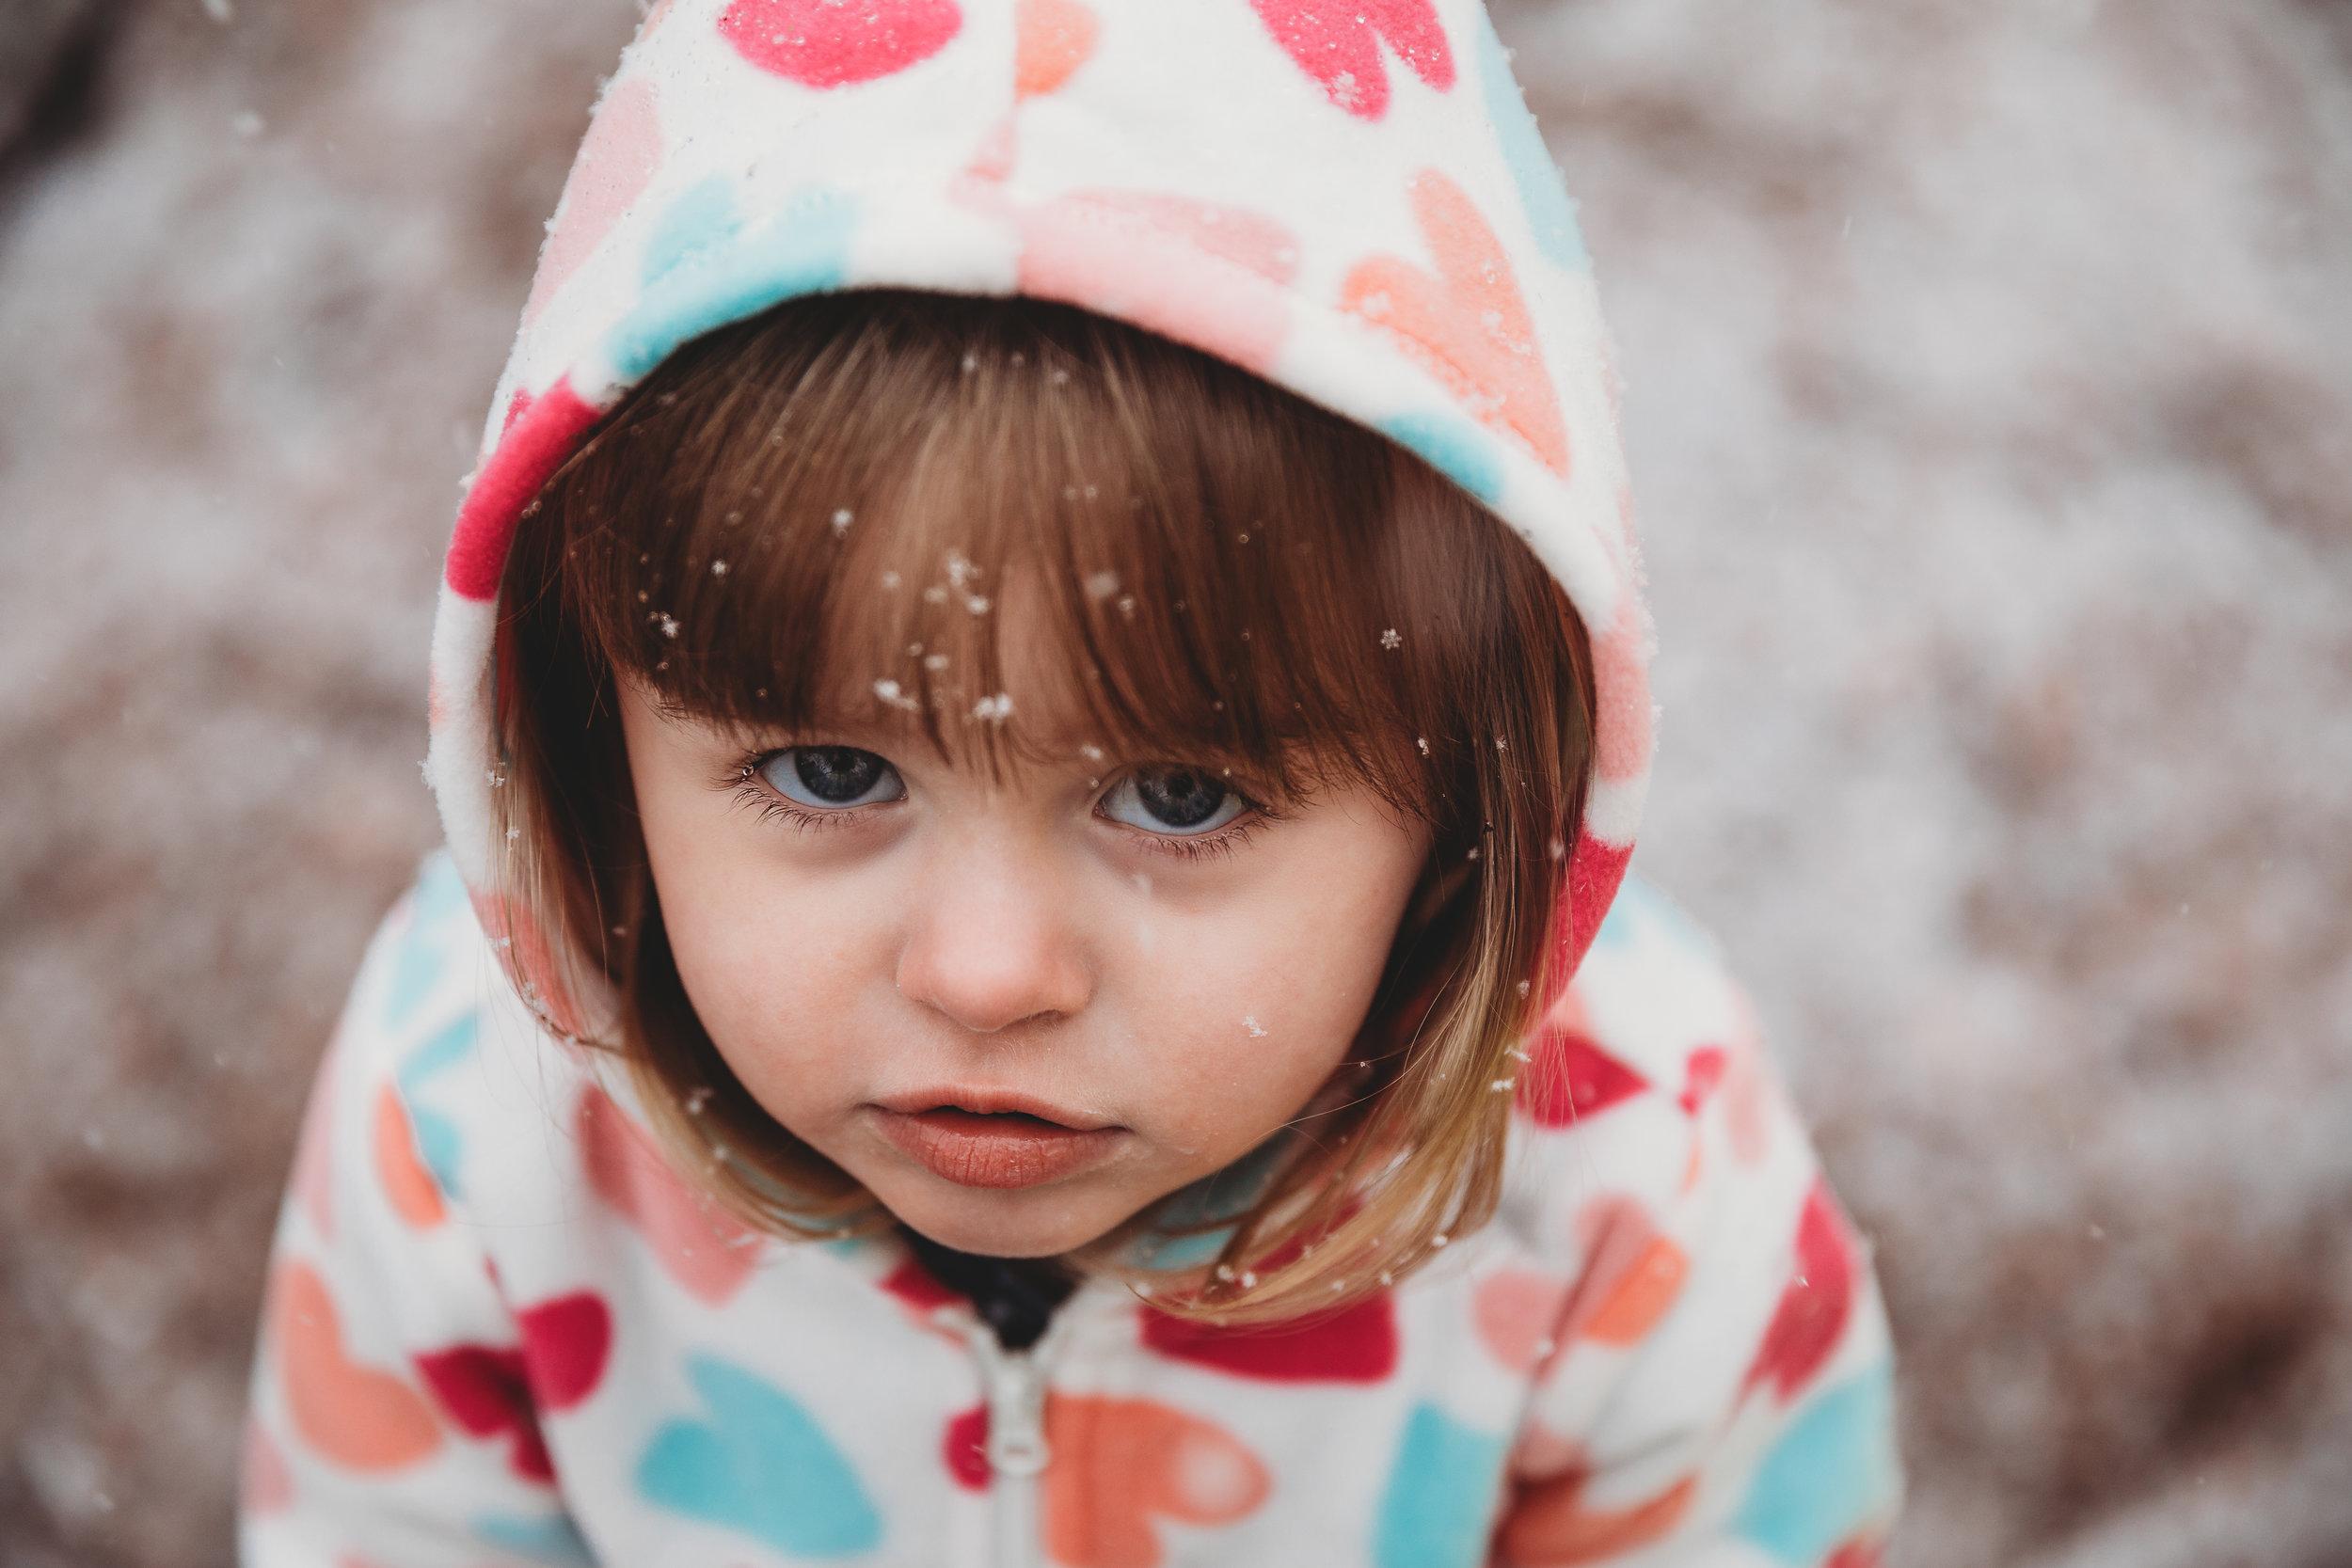 hello-olivia-photography-long-island-photographer-lifestyle-suffolk-girl-snow-cute-kid-.jpg